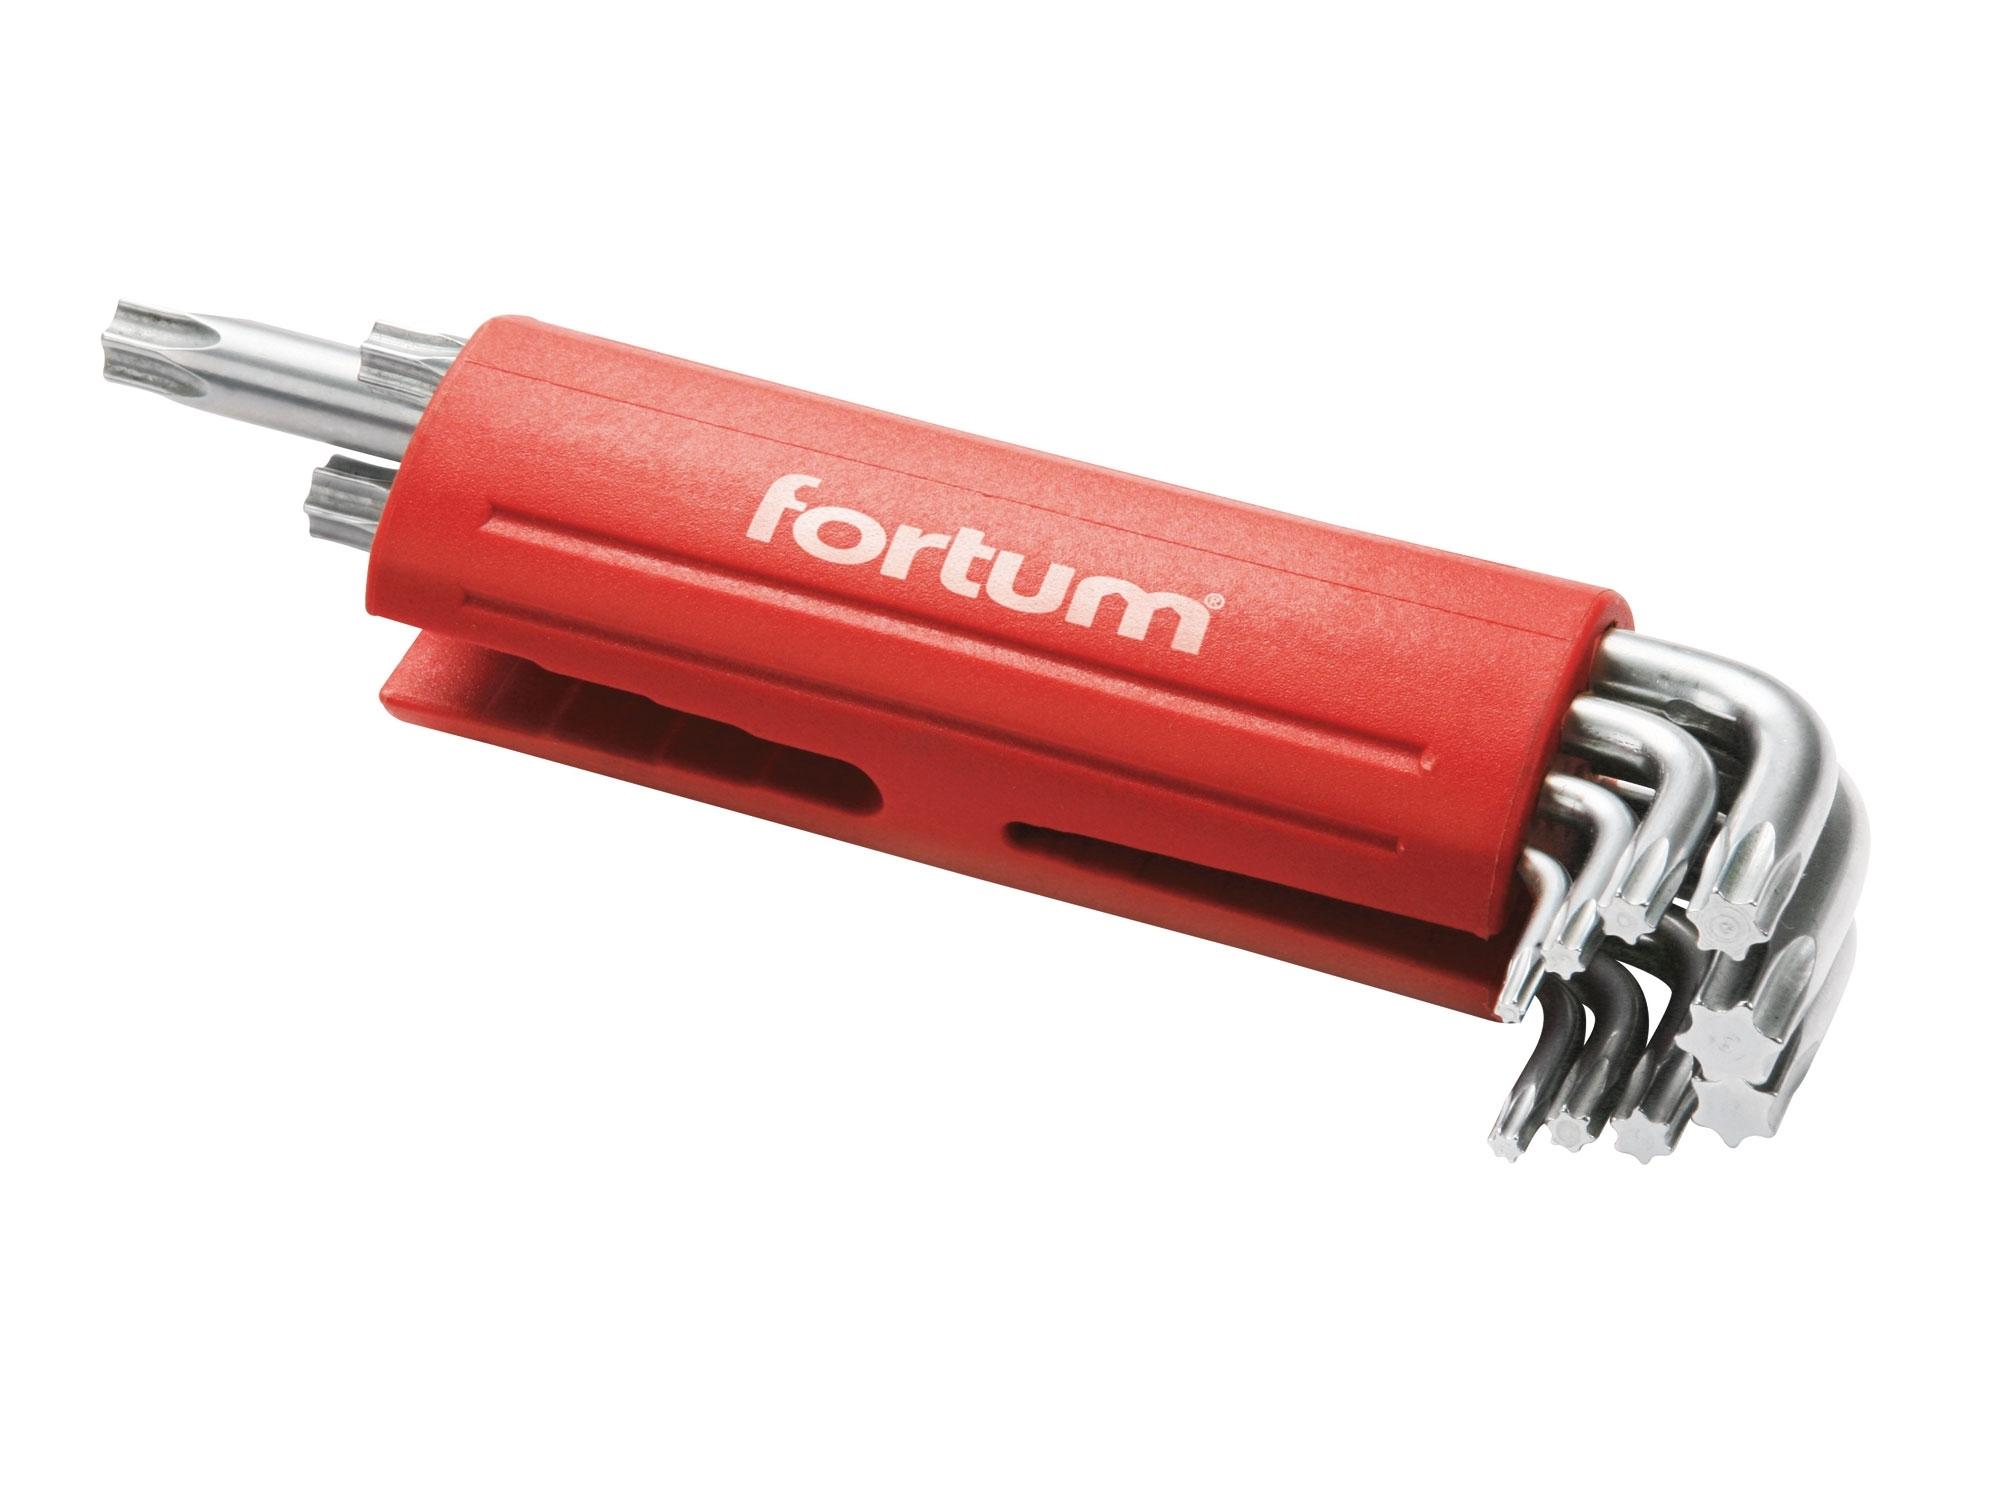 L-klíče TORX, sada 9ks, 10-50